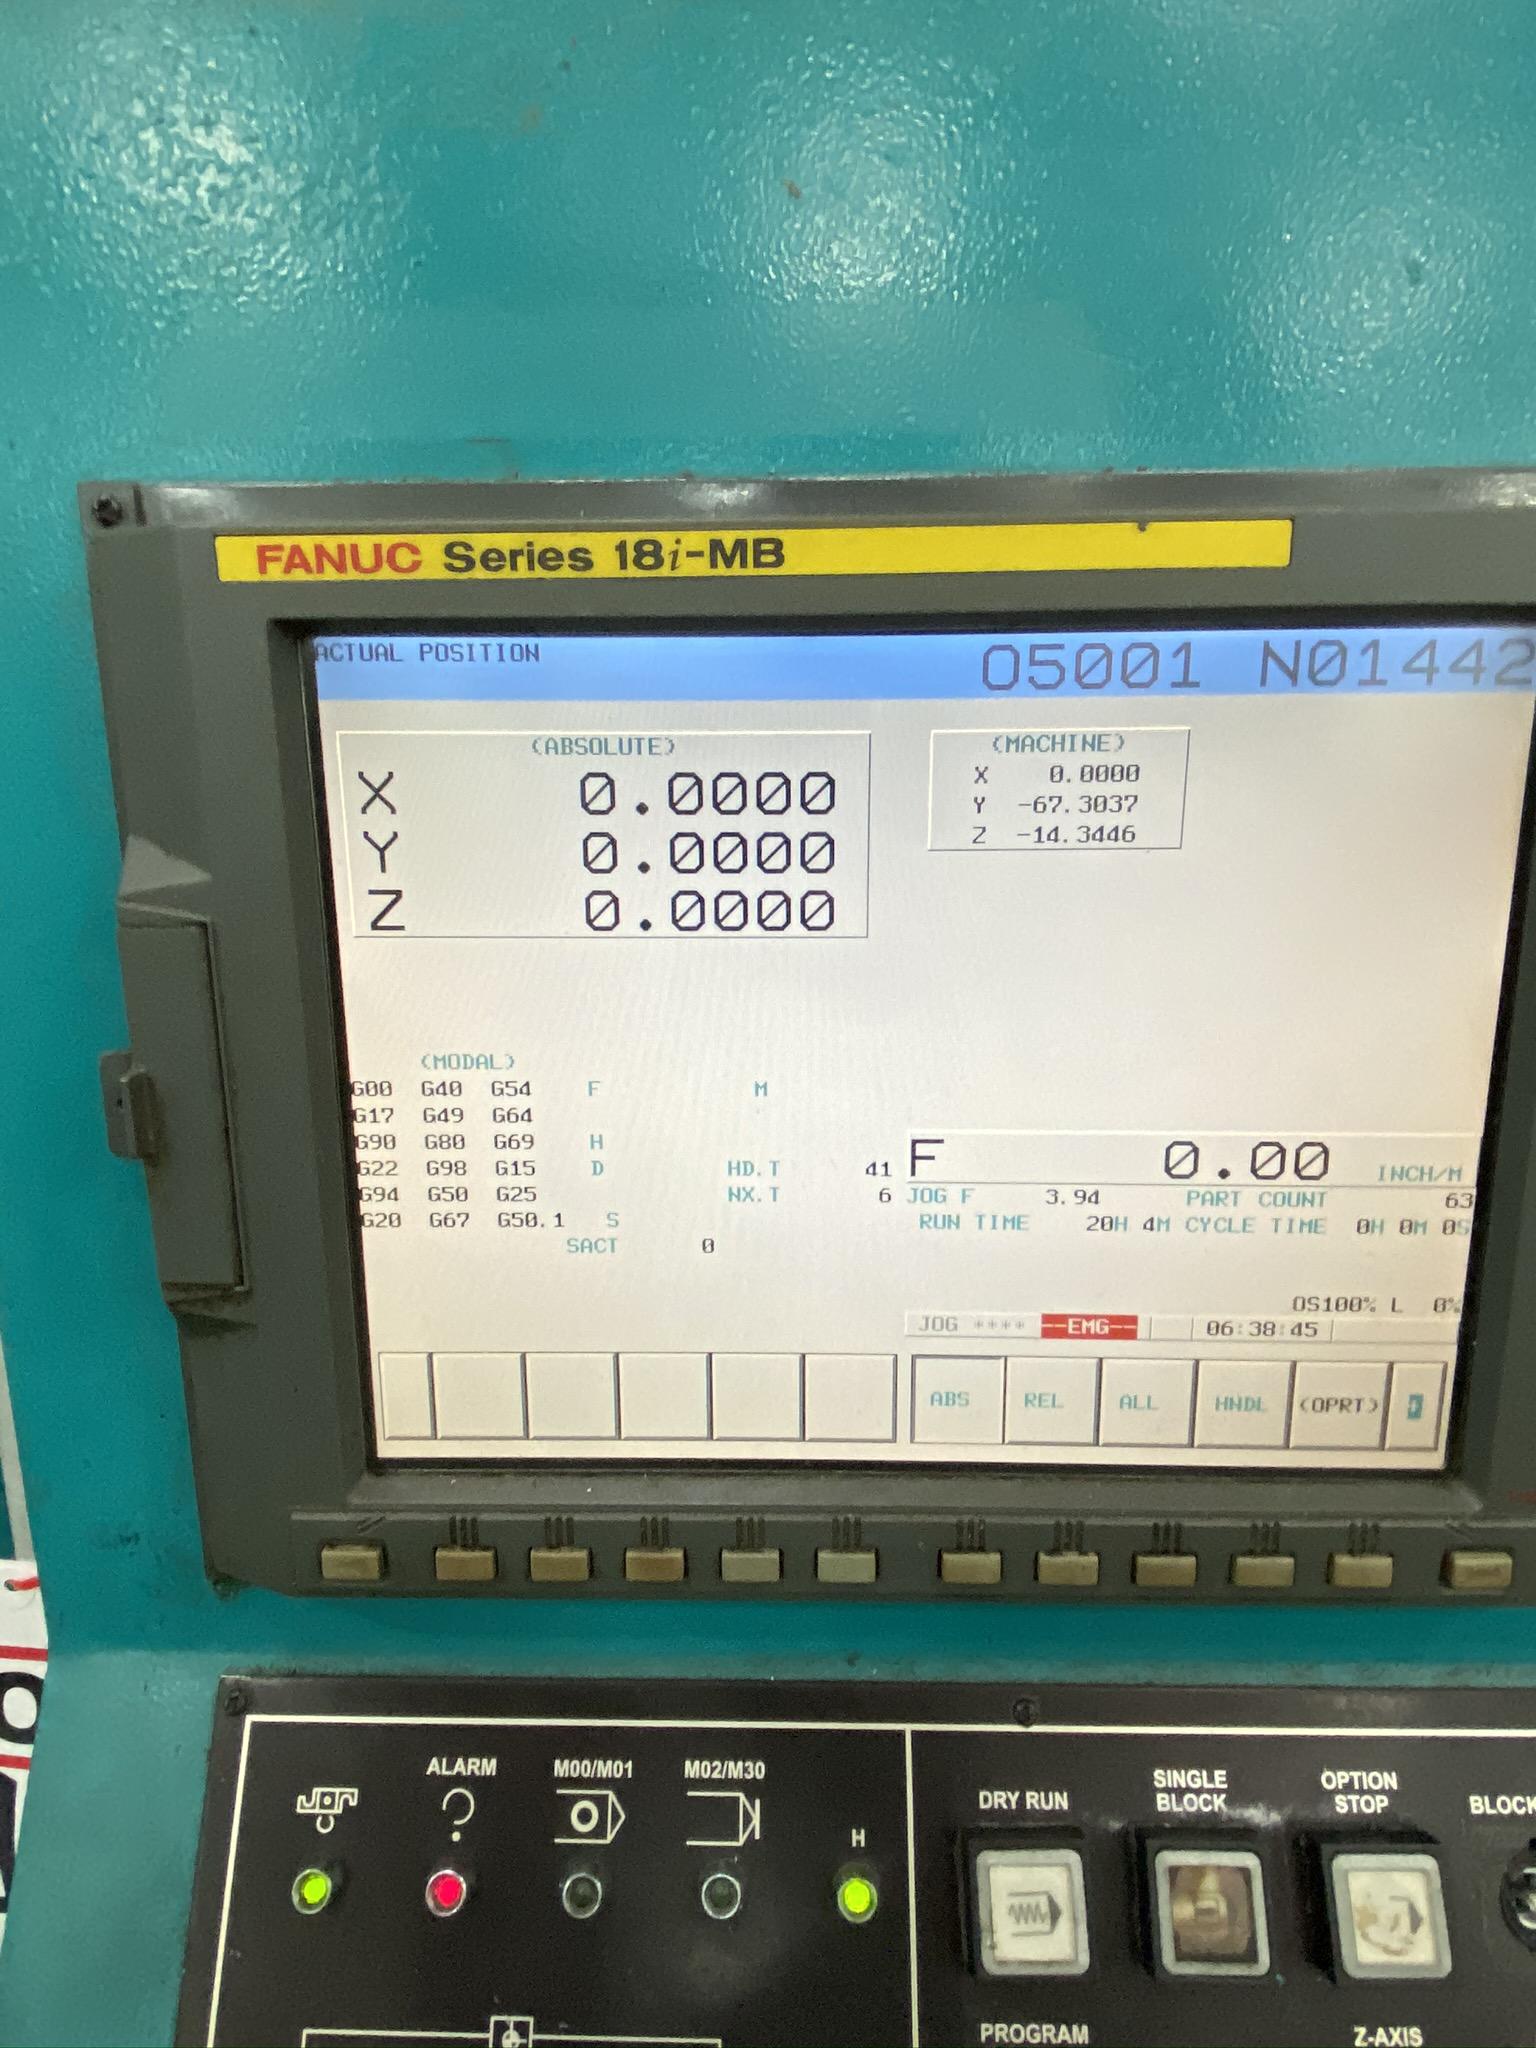 2005 SIGMA CNC DOUBLE COLUMN MACHINING CENTER, MODEL SDV-3219, FANUC 18IMB CNC CONTROL - Image 6 of 31